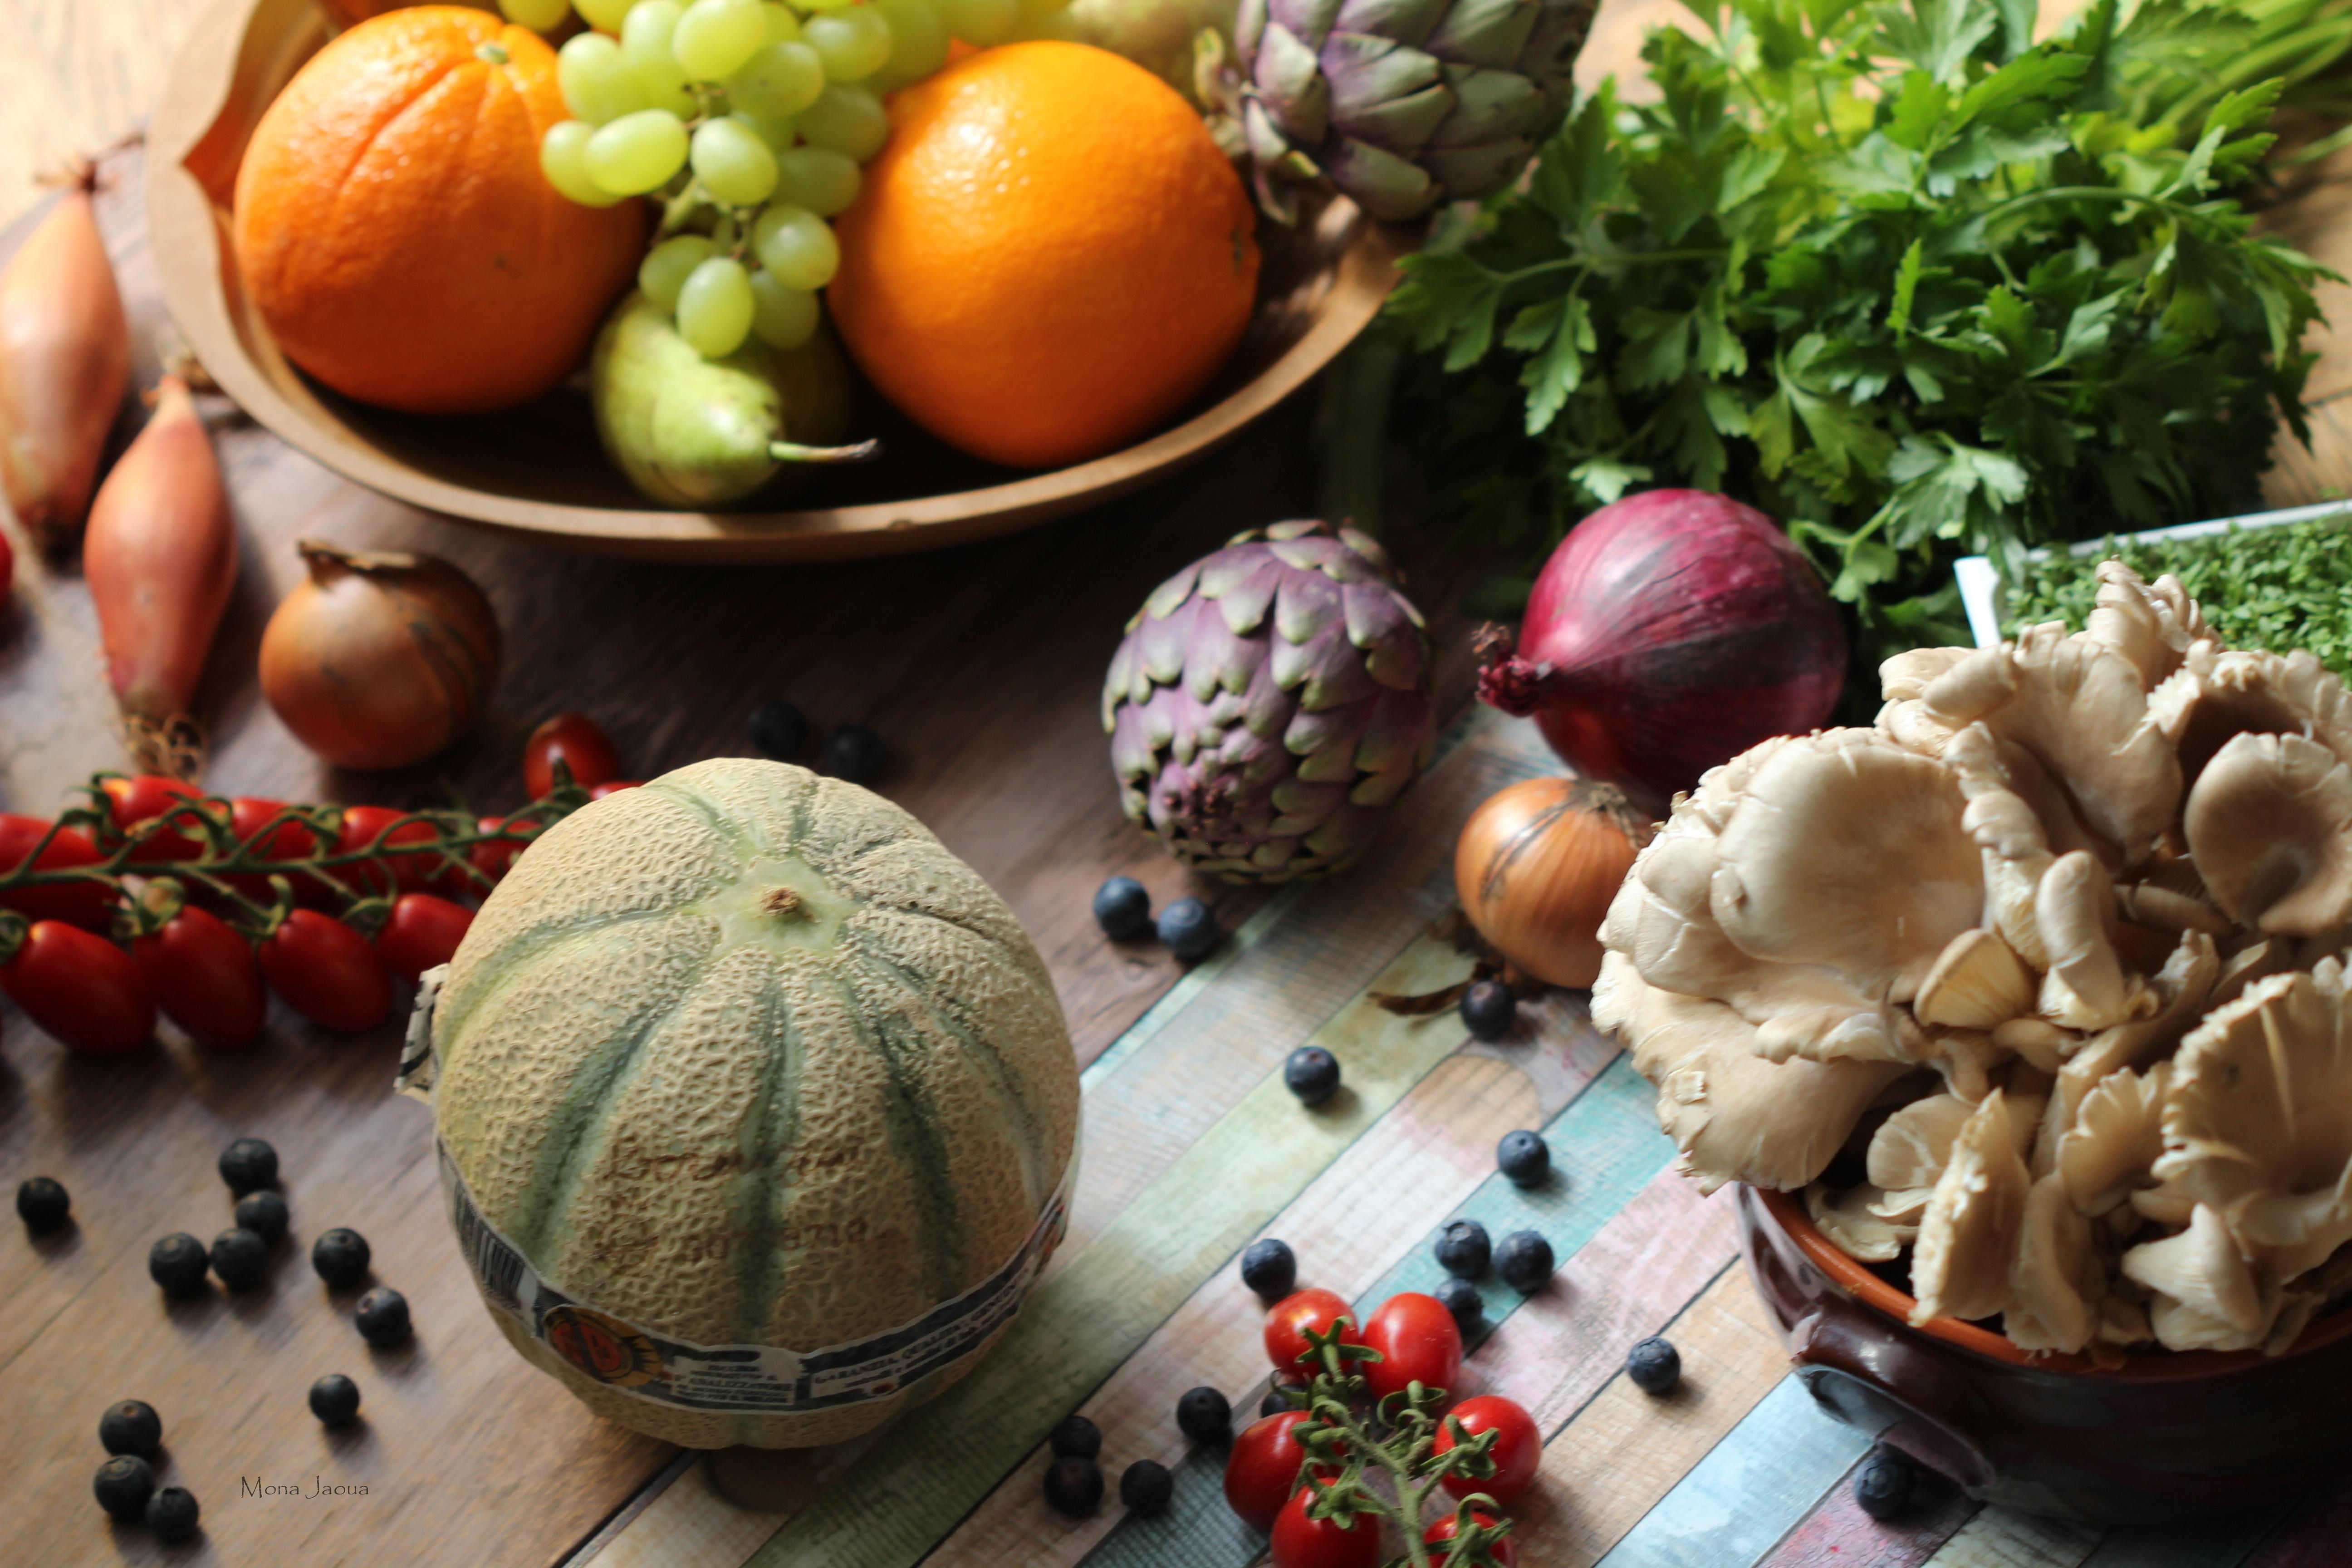 Kde nakupuju ovoce a zeleninu :)